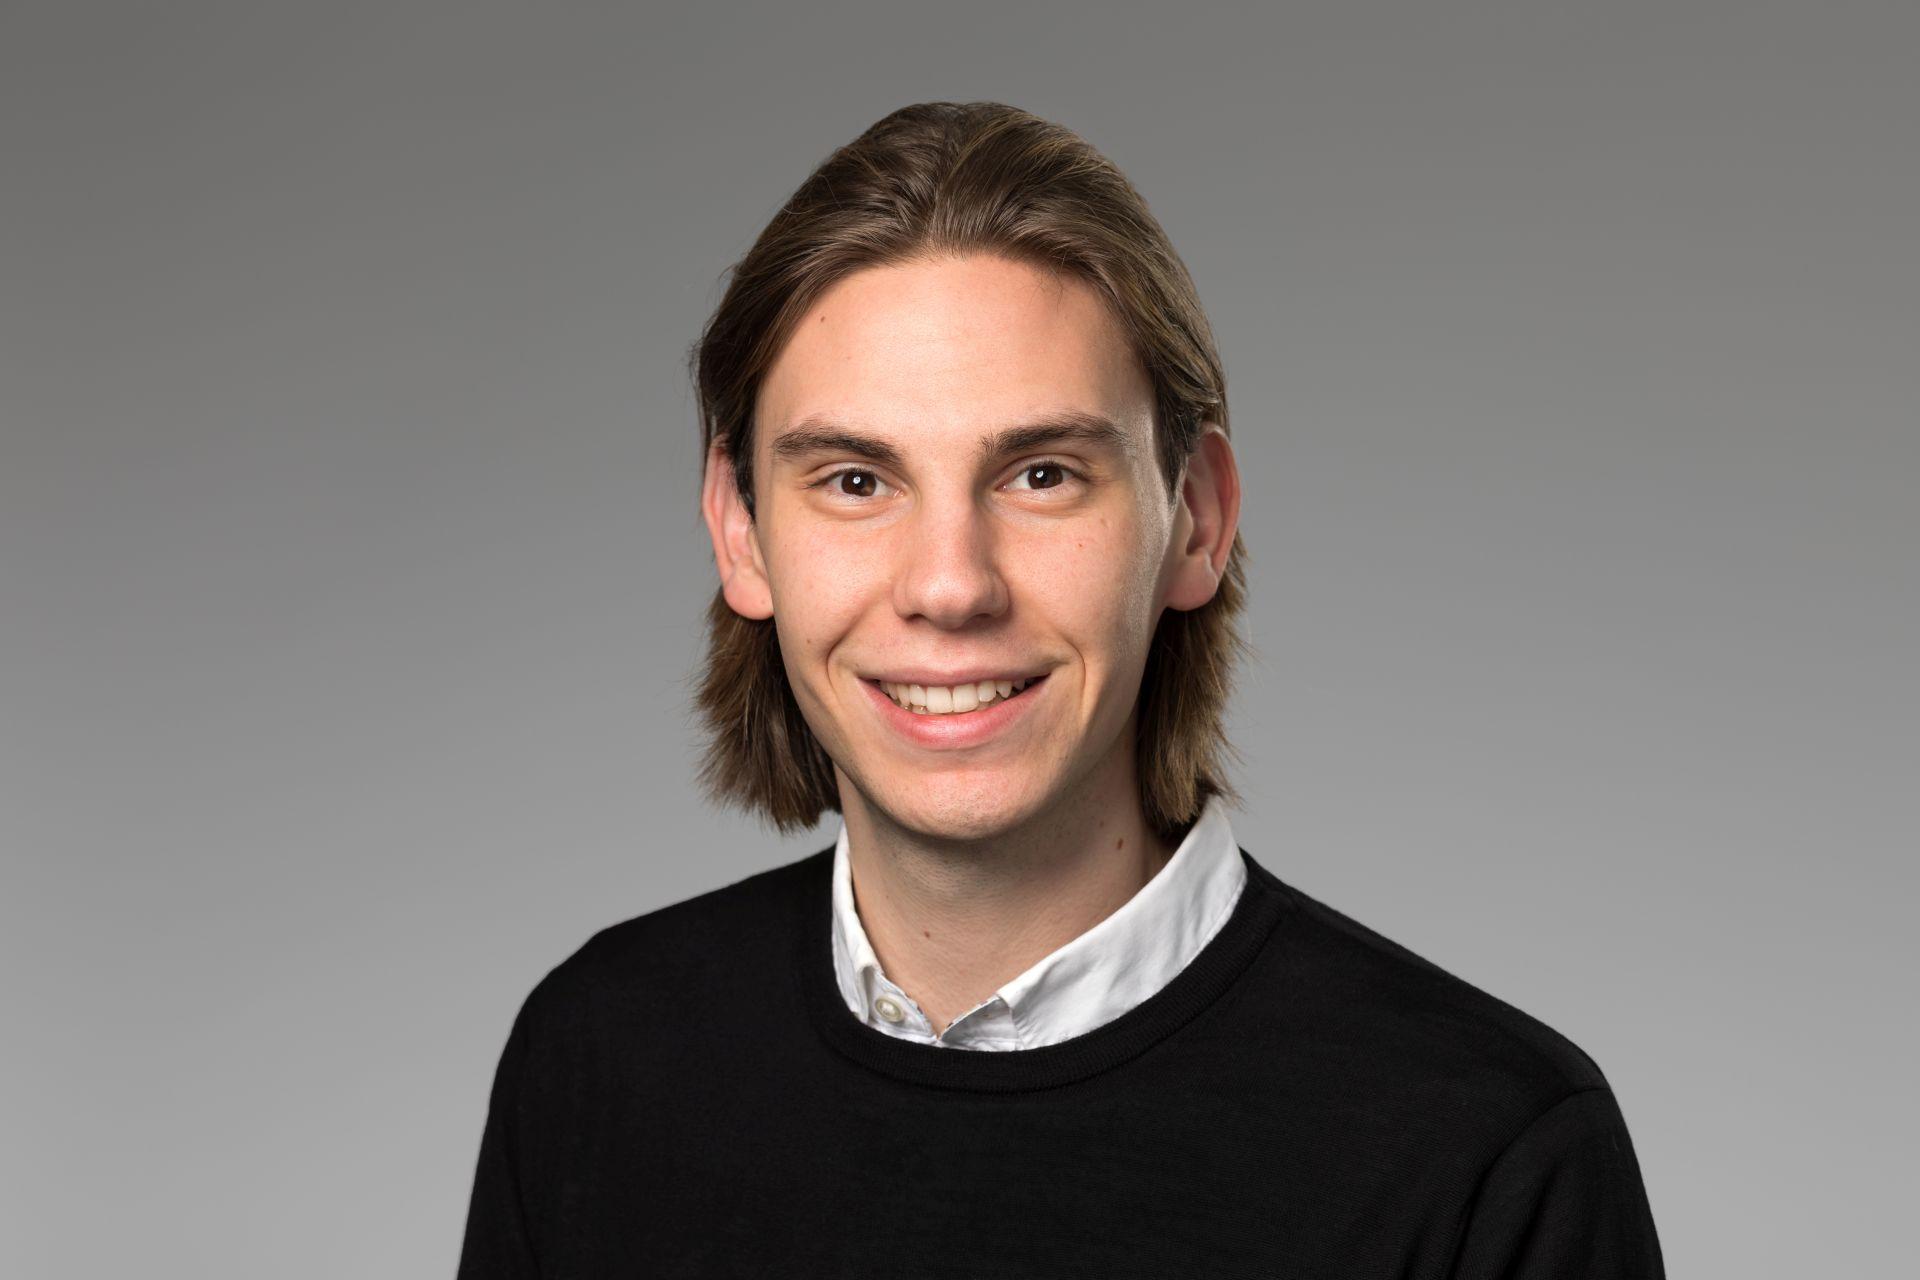 Jonas Schmidbauer